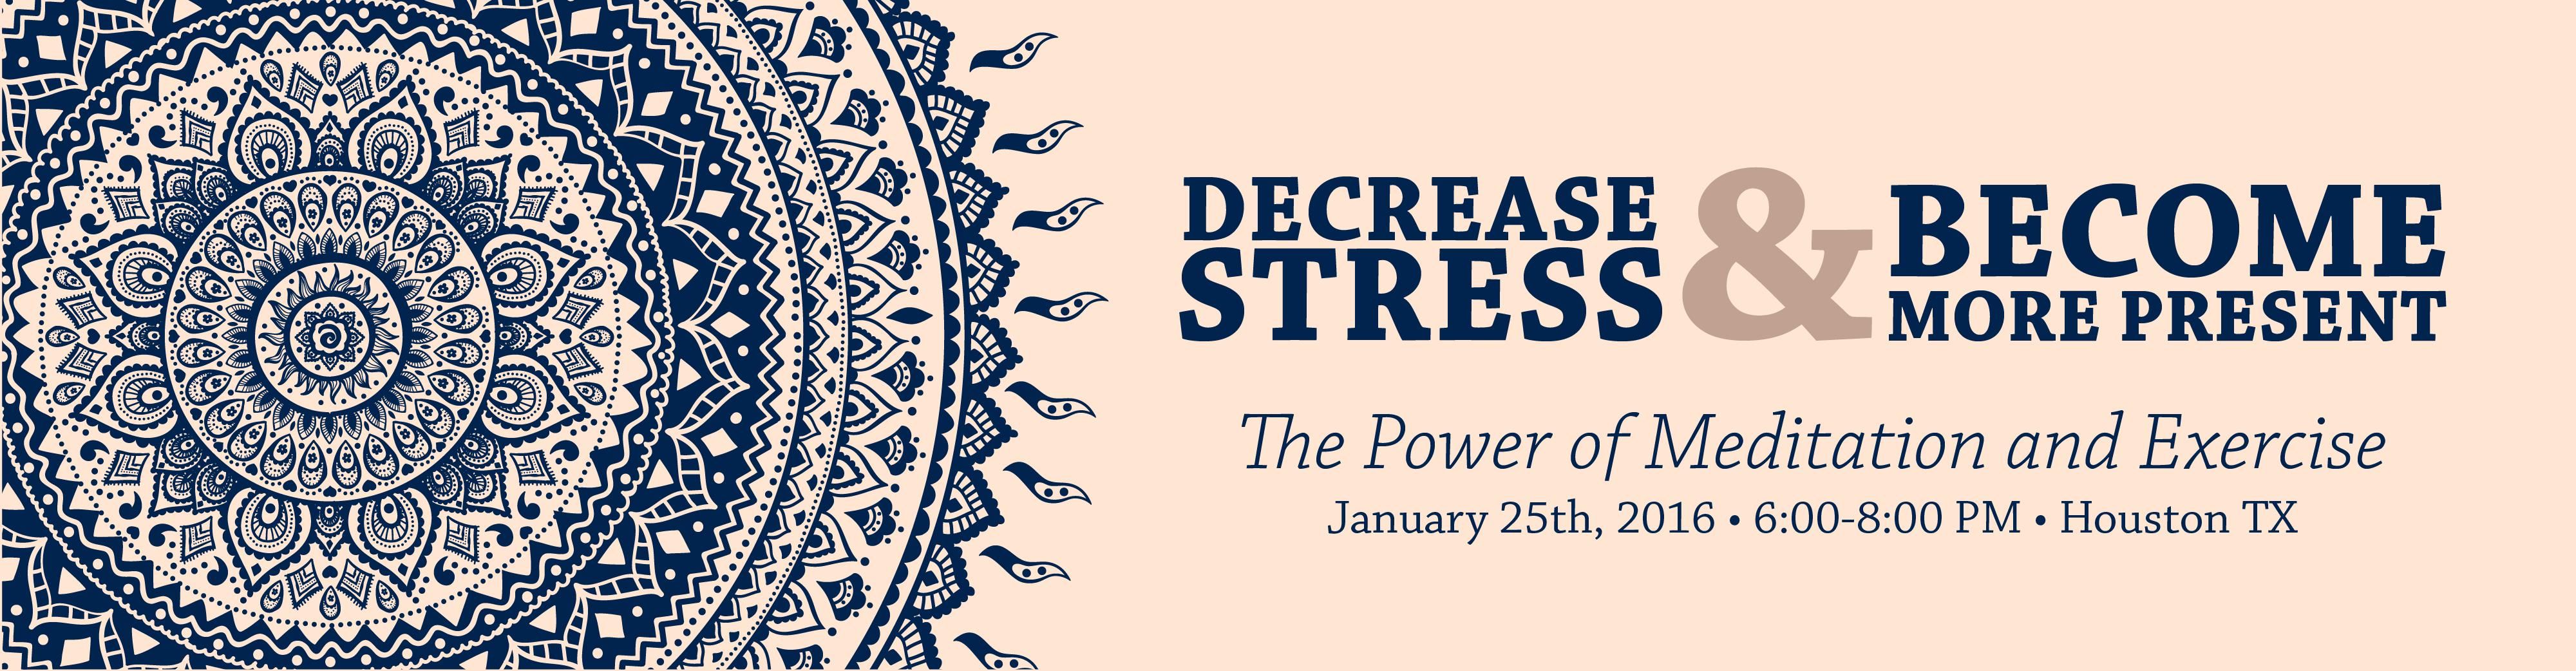 wellness-event-decrease-tress-become-more-present